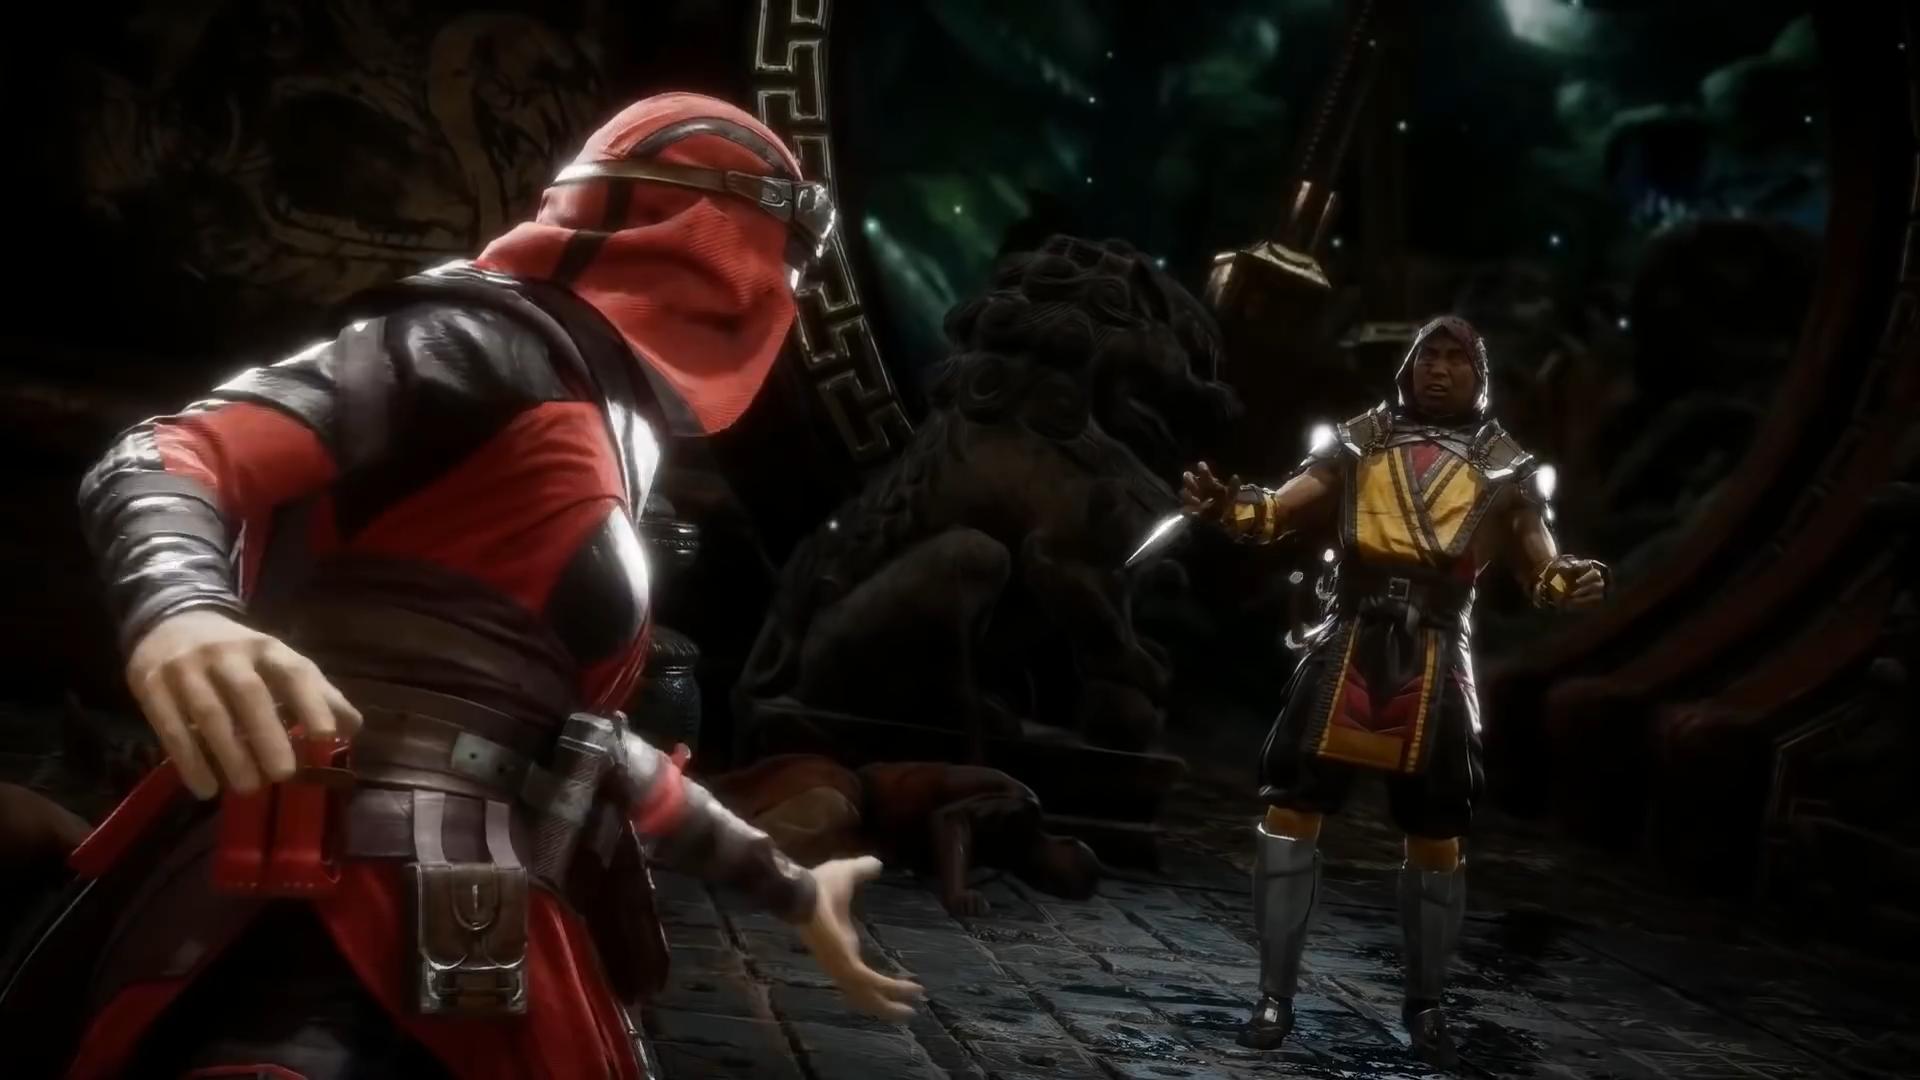 IMG_20190121_193640.943.jpg - Mortal Kombat 11